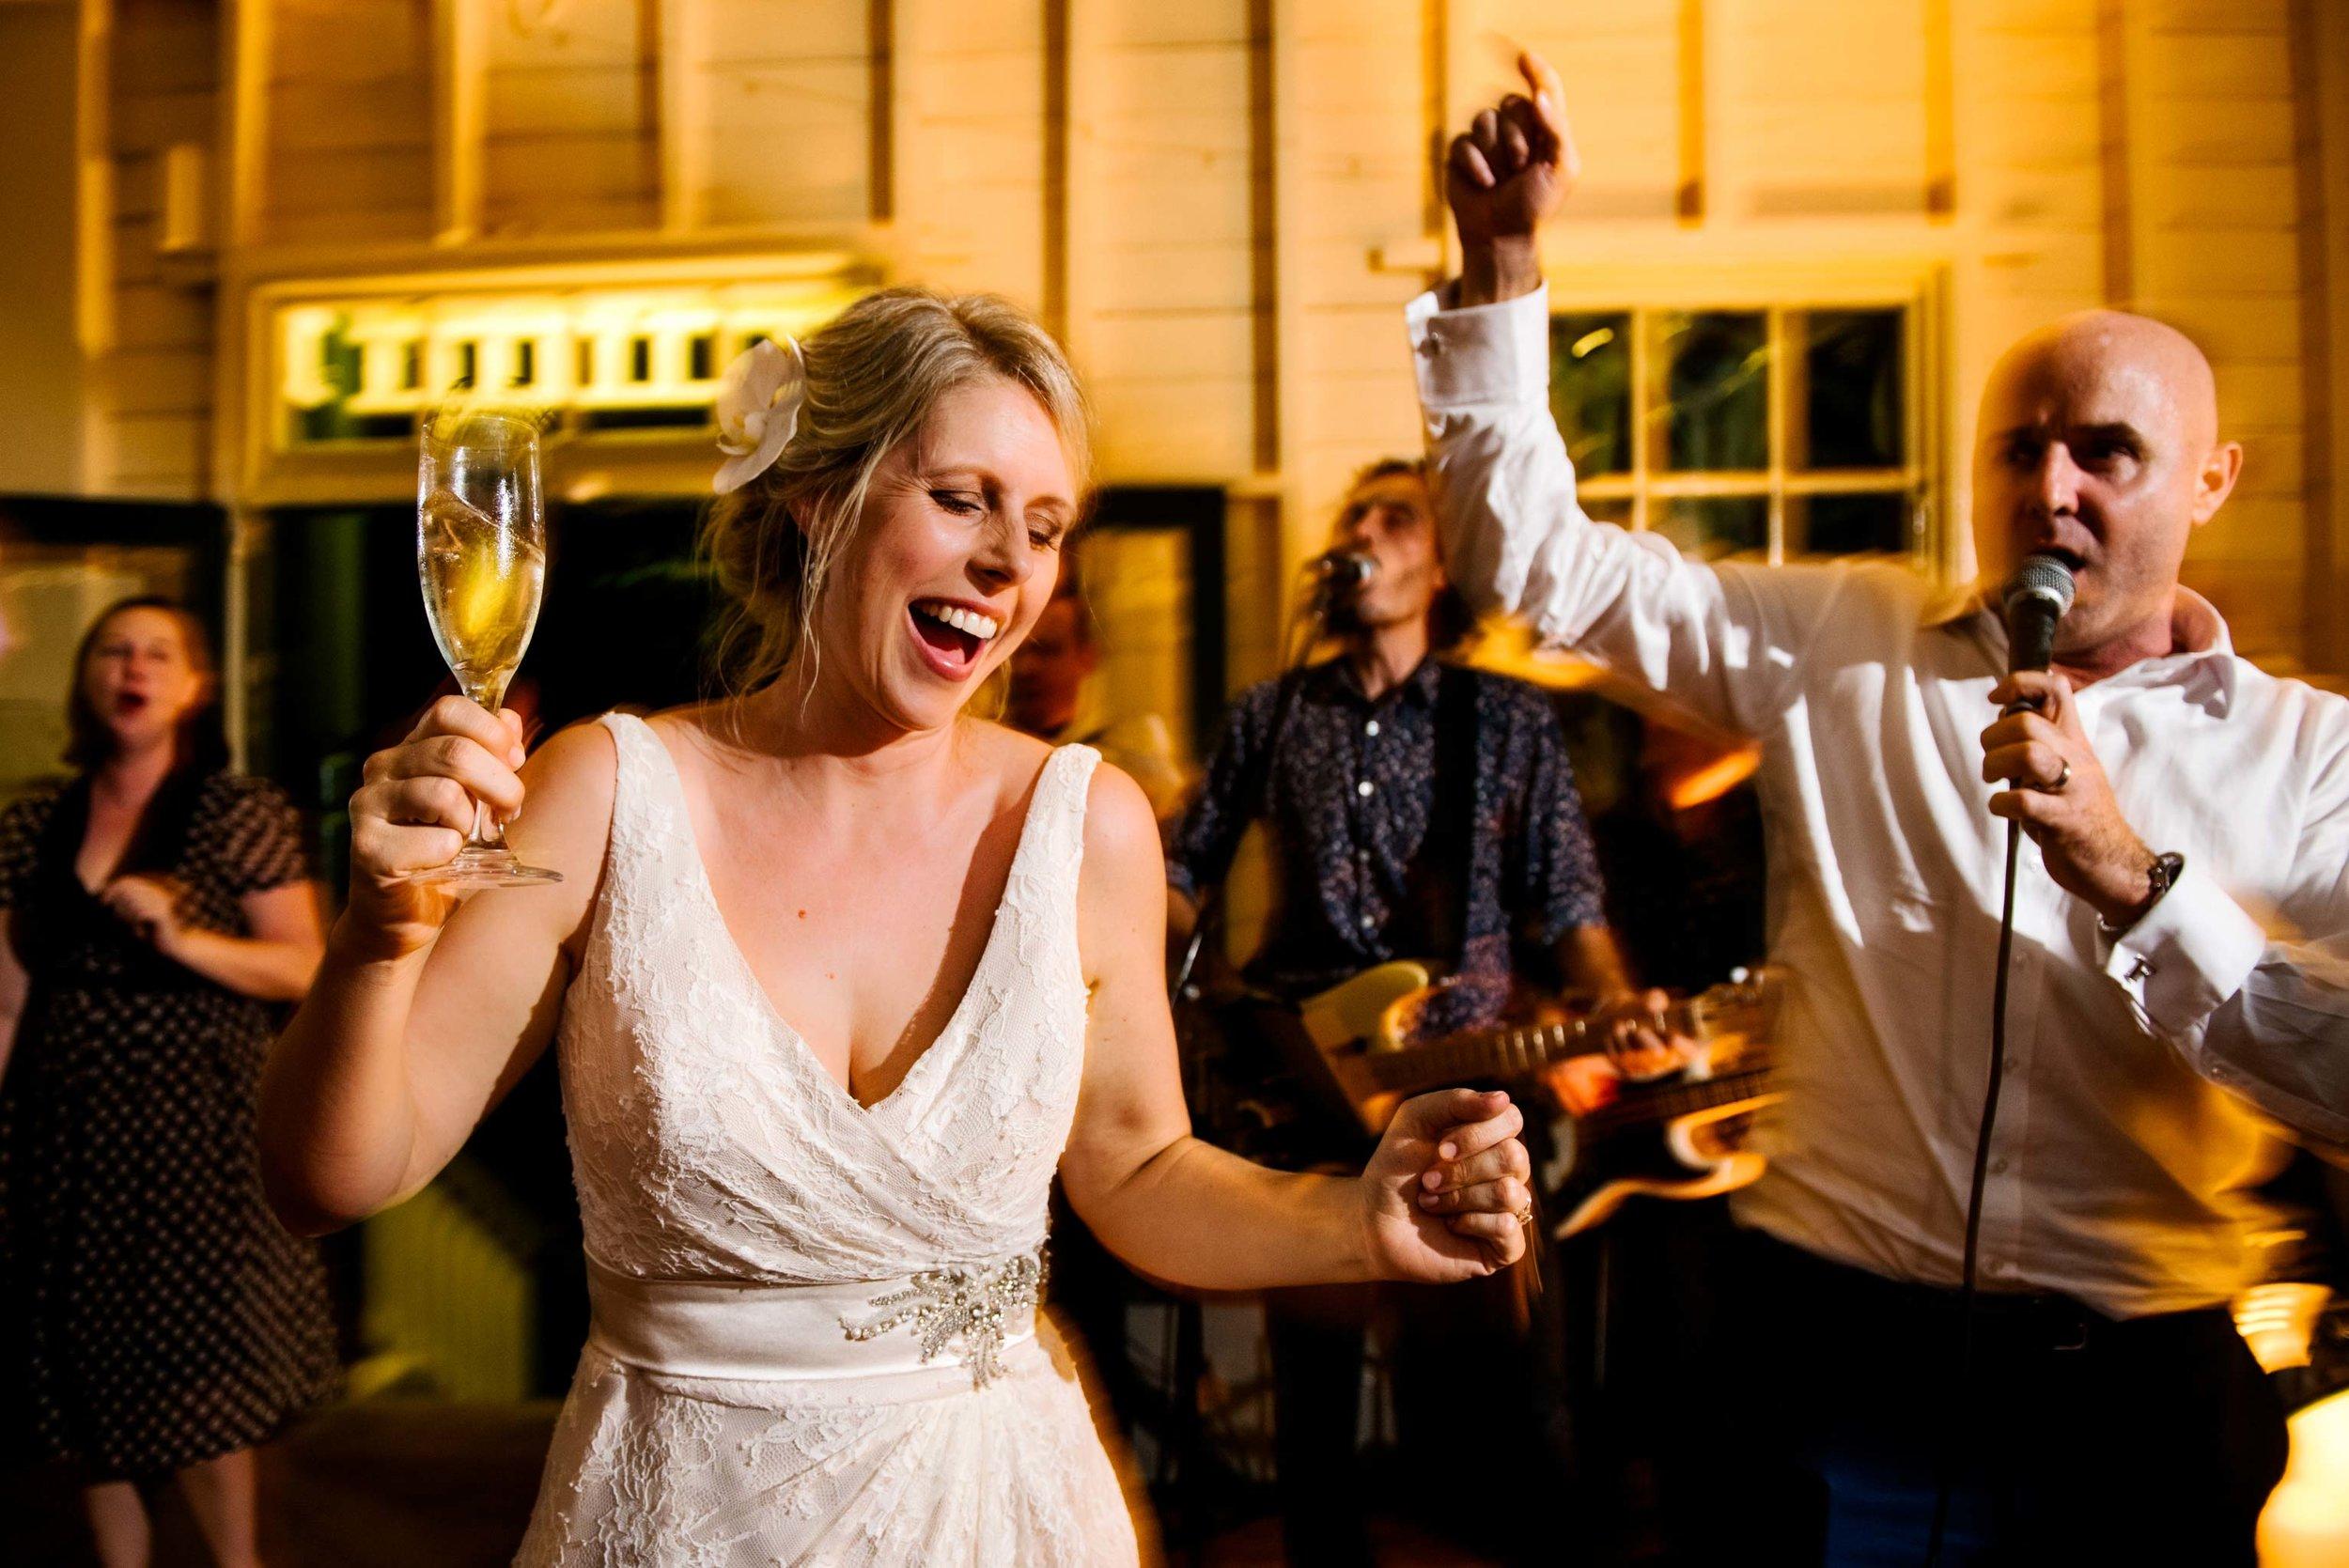 Groom singing to bride on dance floor at Athol Hall wedding